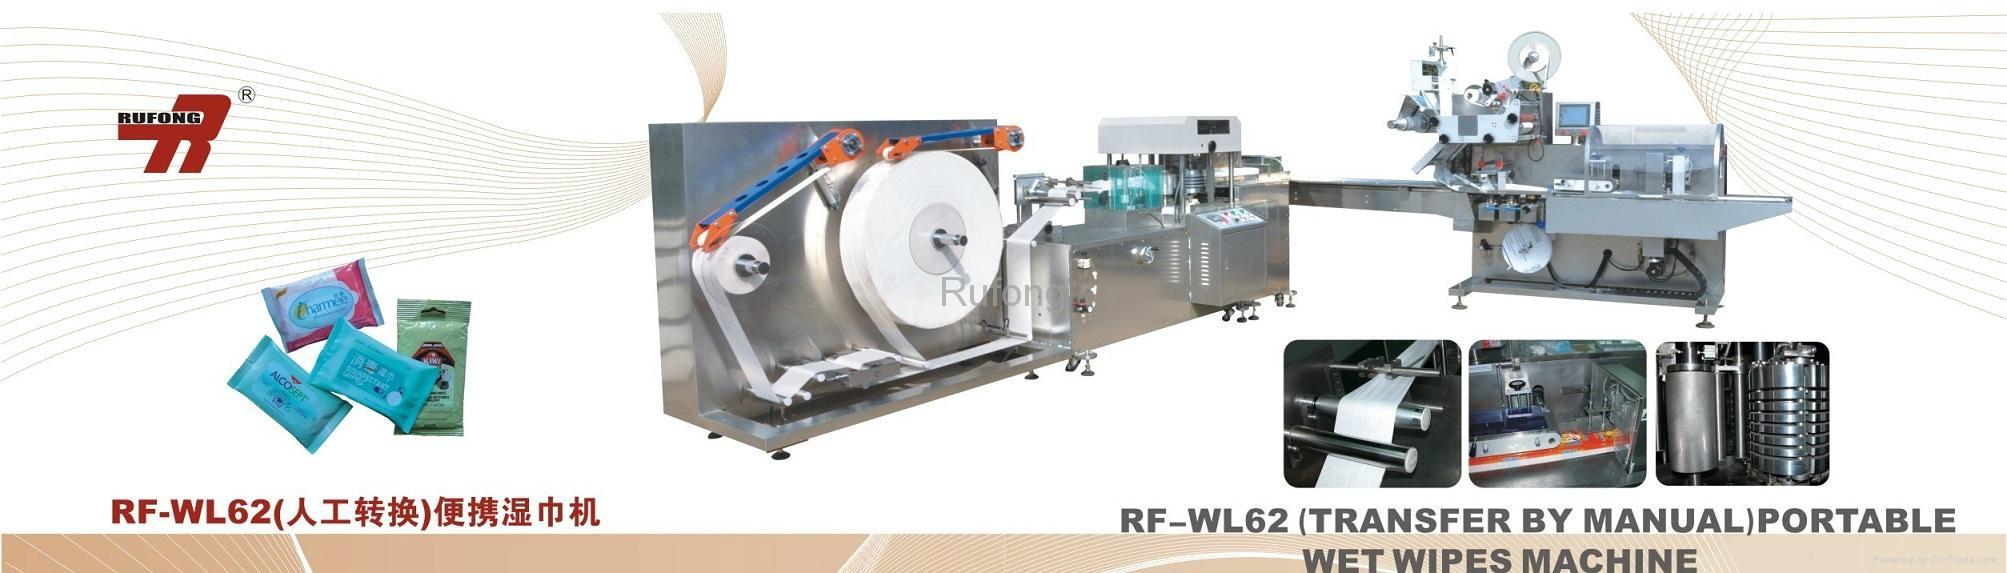 RF-WL62 (Transfer by Manual) Portable Wet Wipes Machine 2